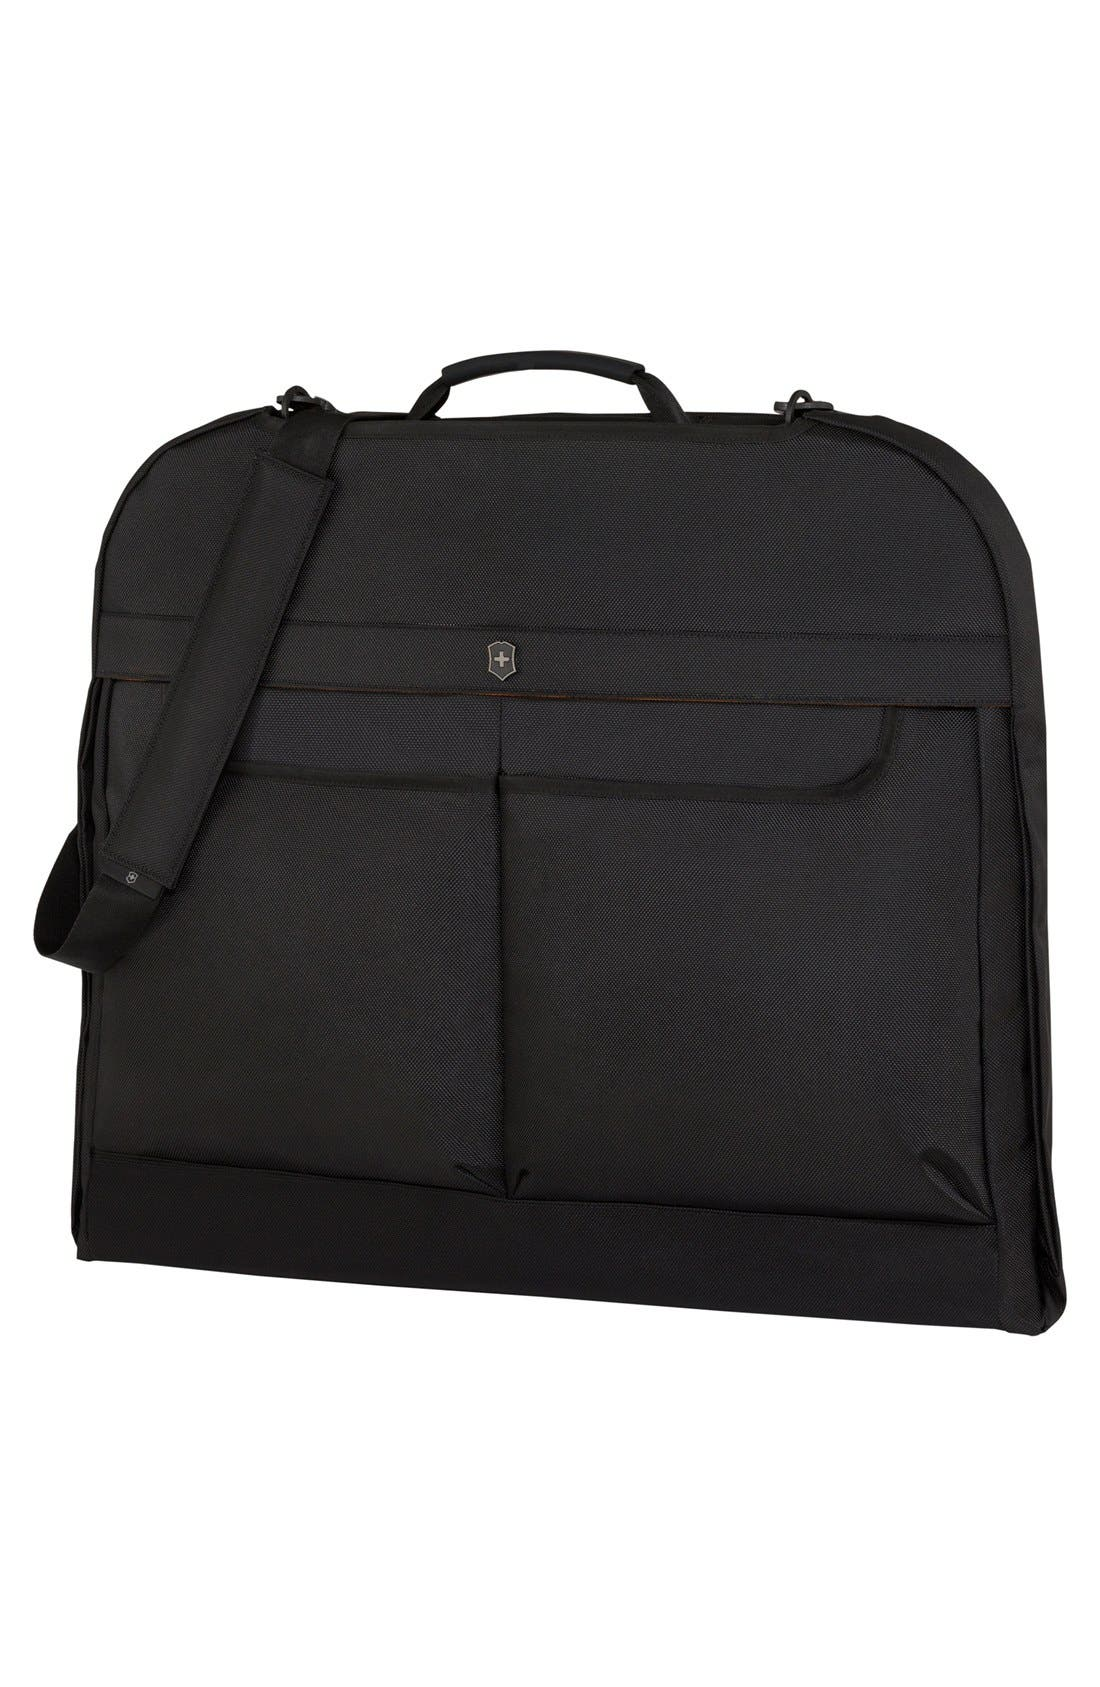 WT 5.0 Deluxe Garment Bag,                         Main,                         color, 001